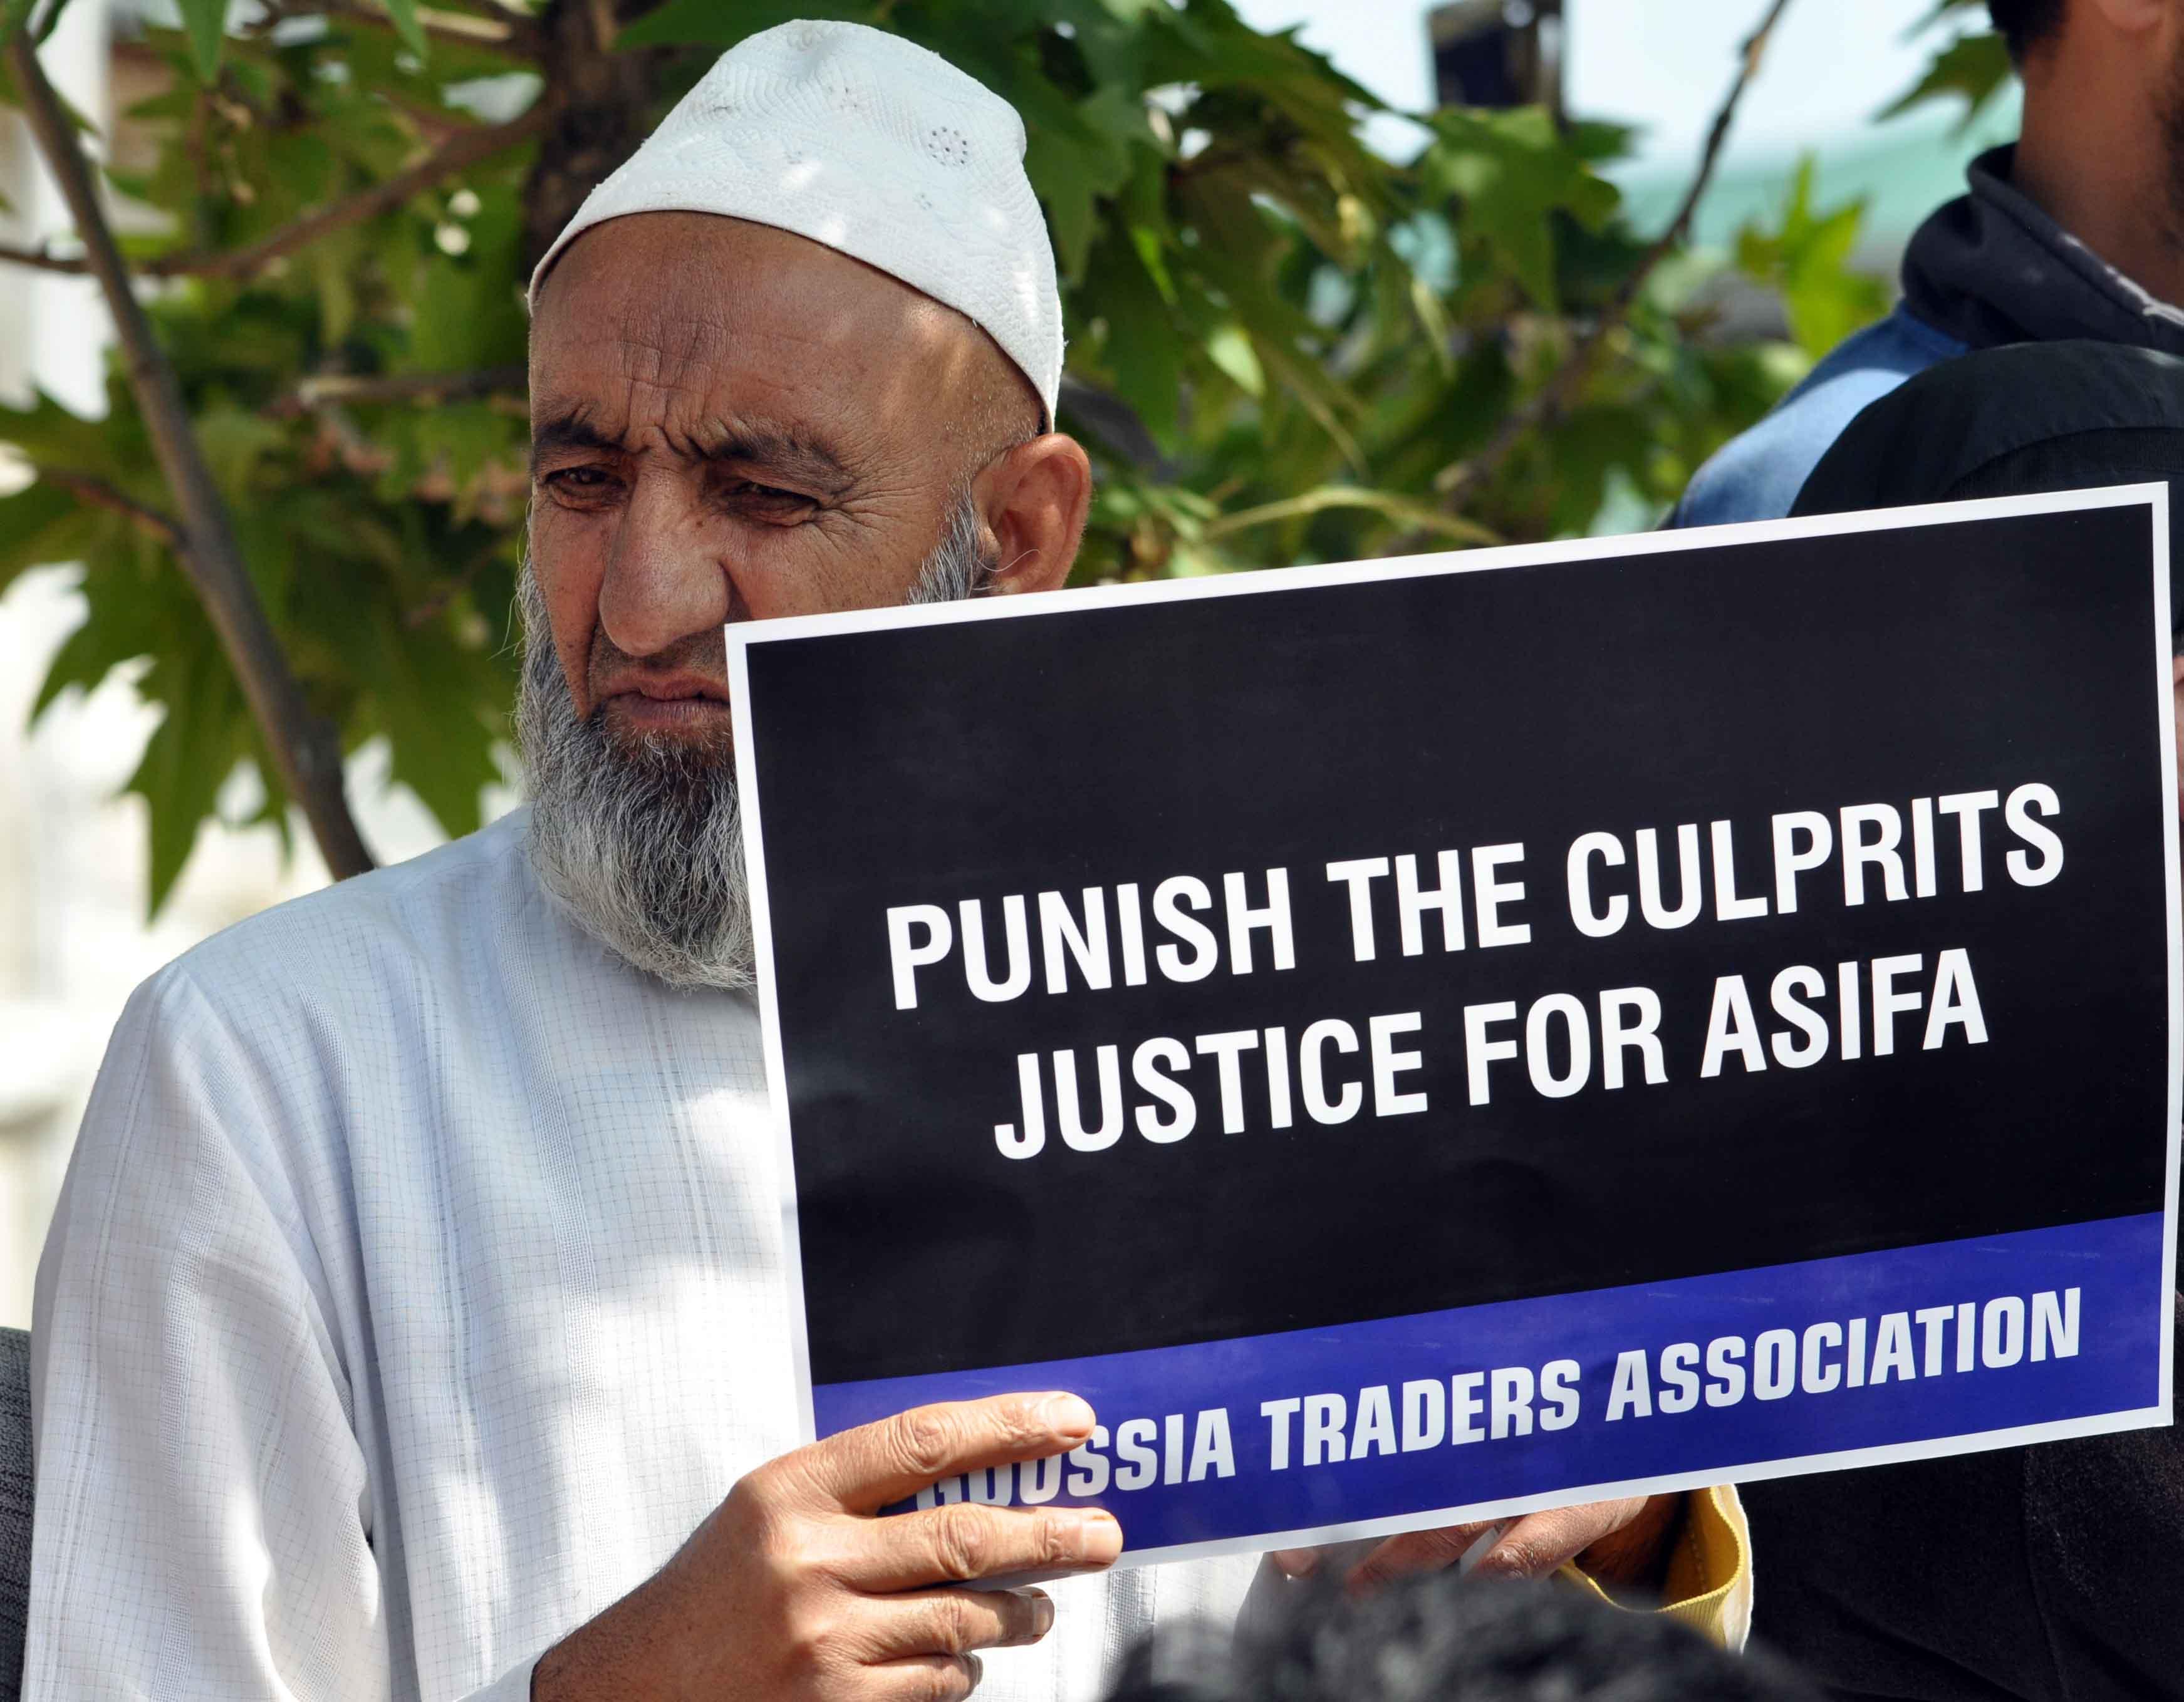 A protestor in Kashmir